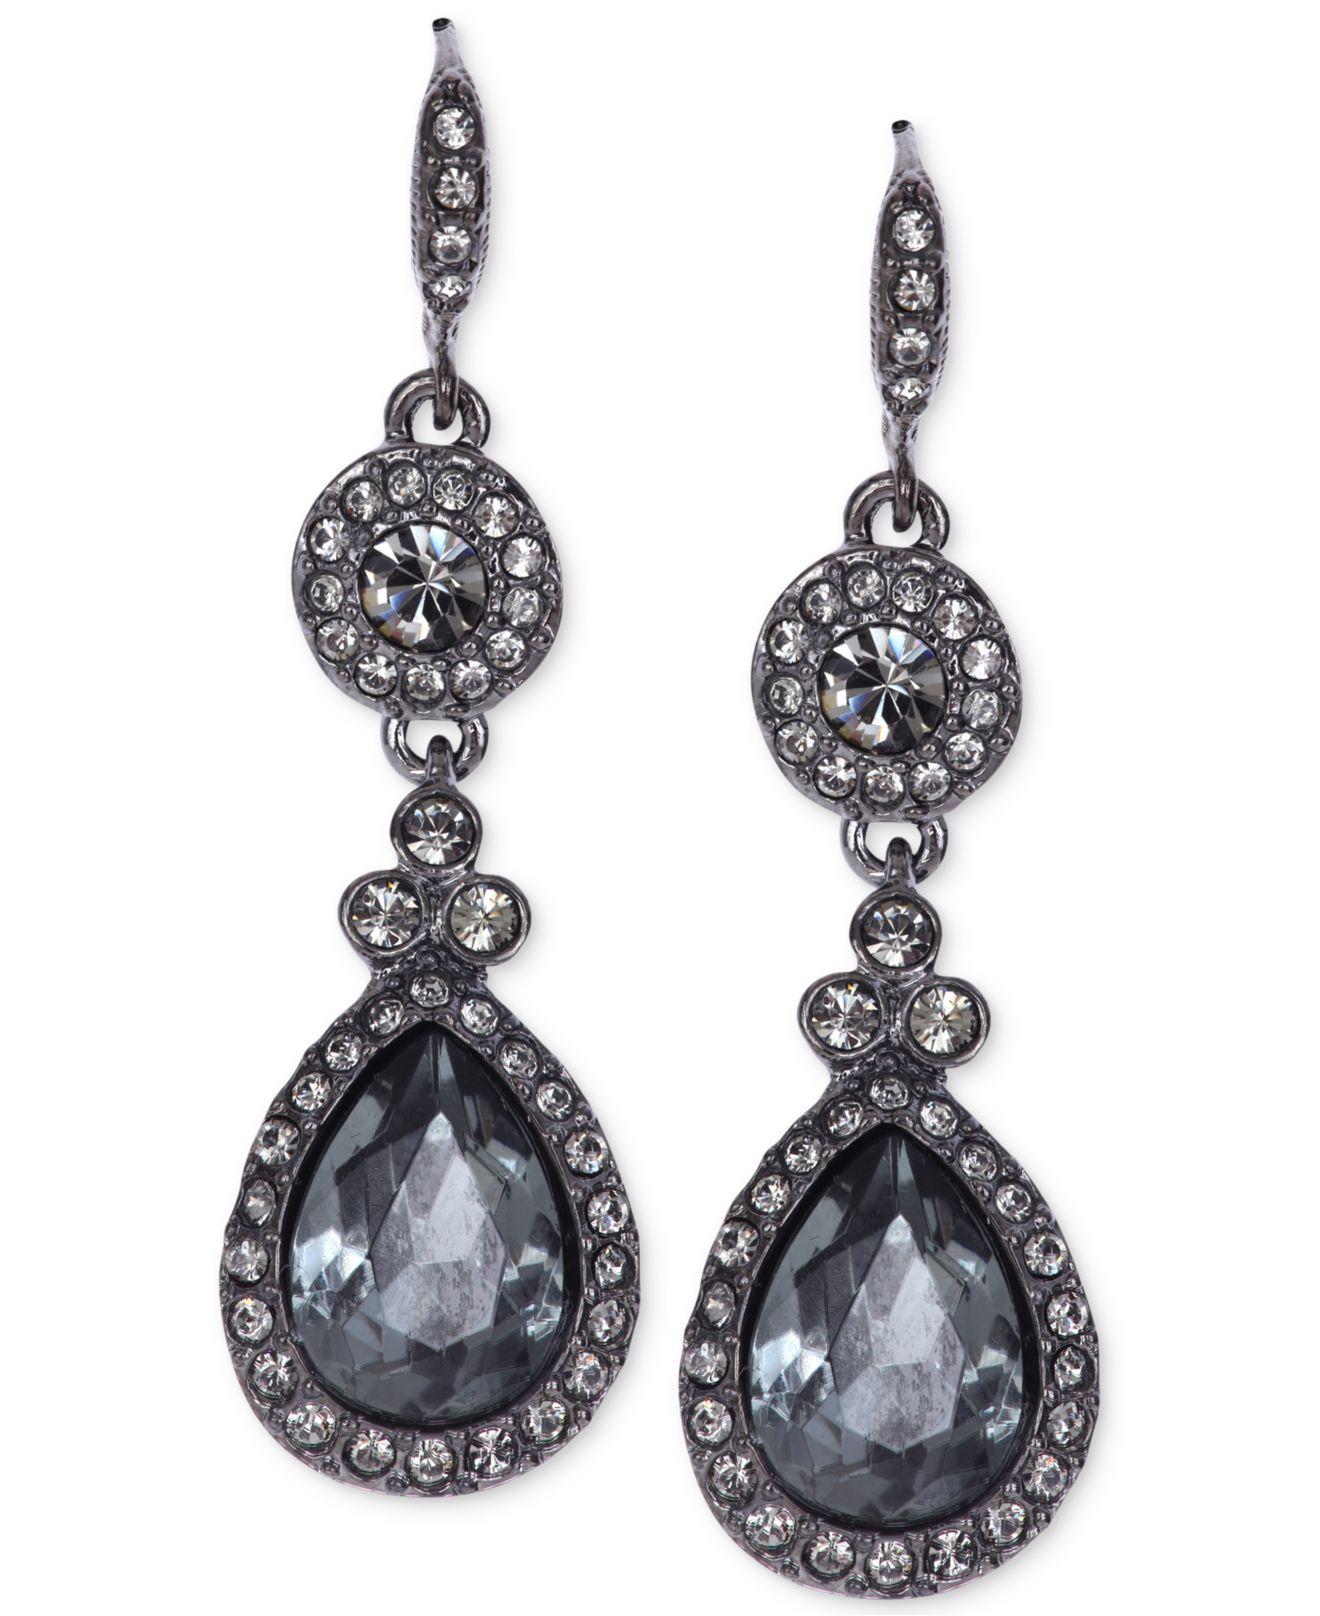 Givenchy Light Hematite Tone Black Crystal Teardrop Earrings In